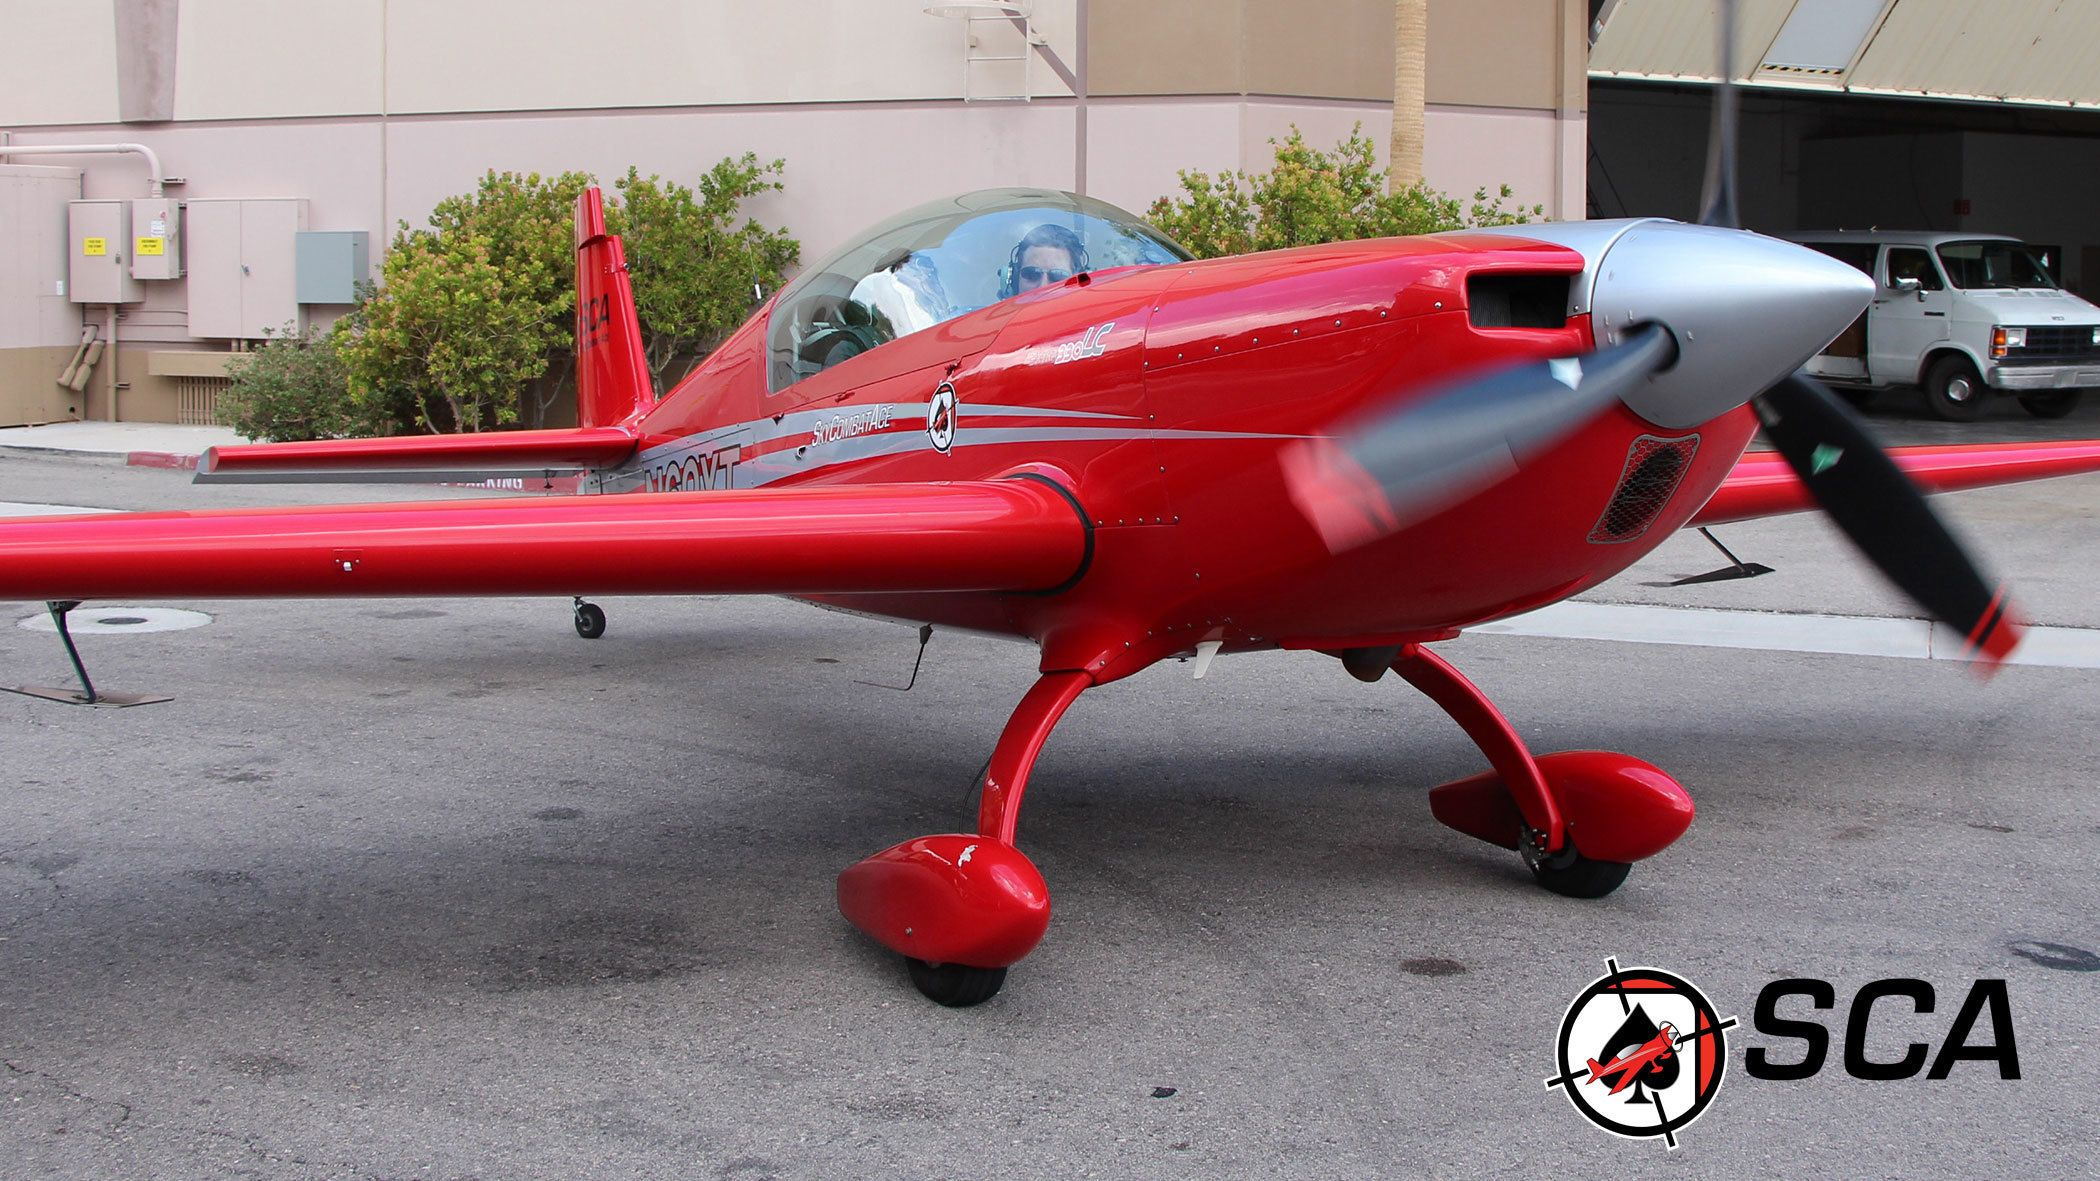 Red Sky Combat Ace airplane in Las Vegas